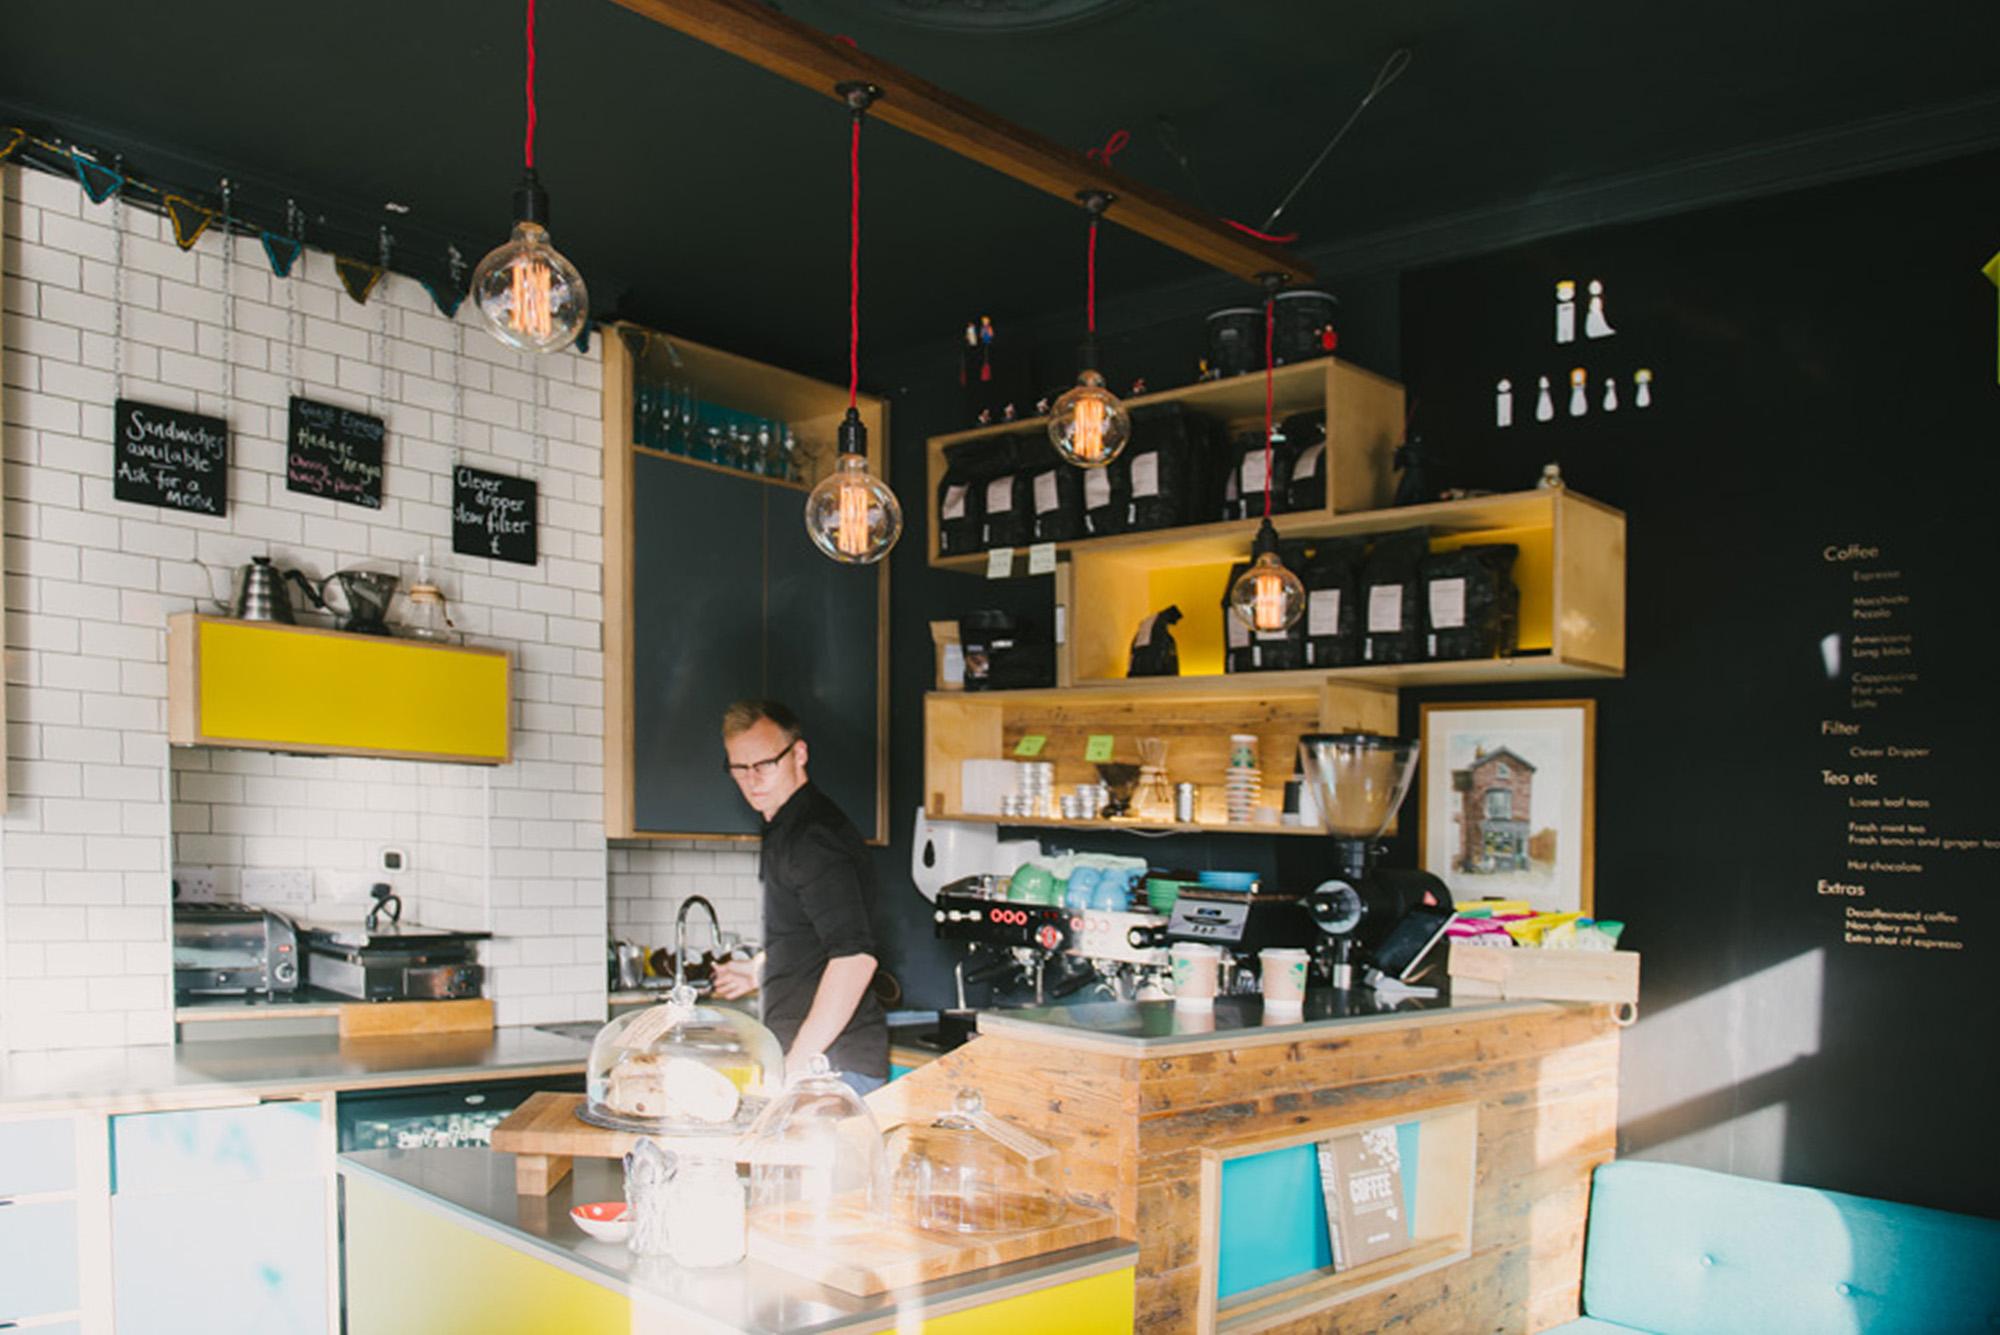 Cafe design services